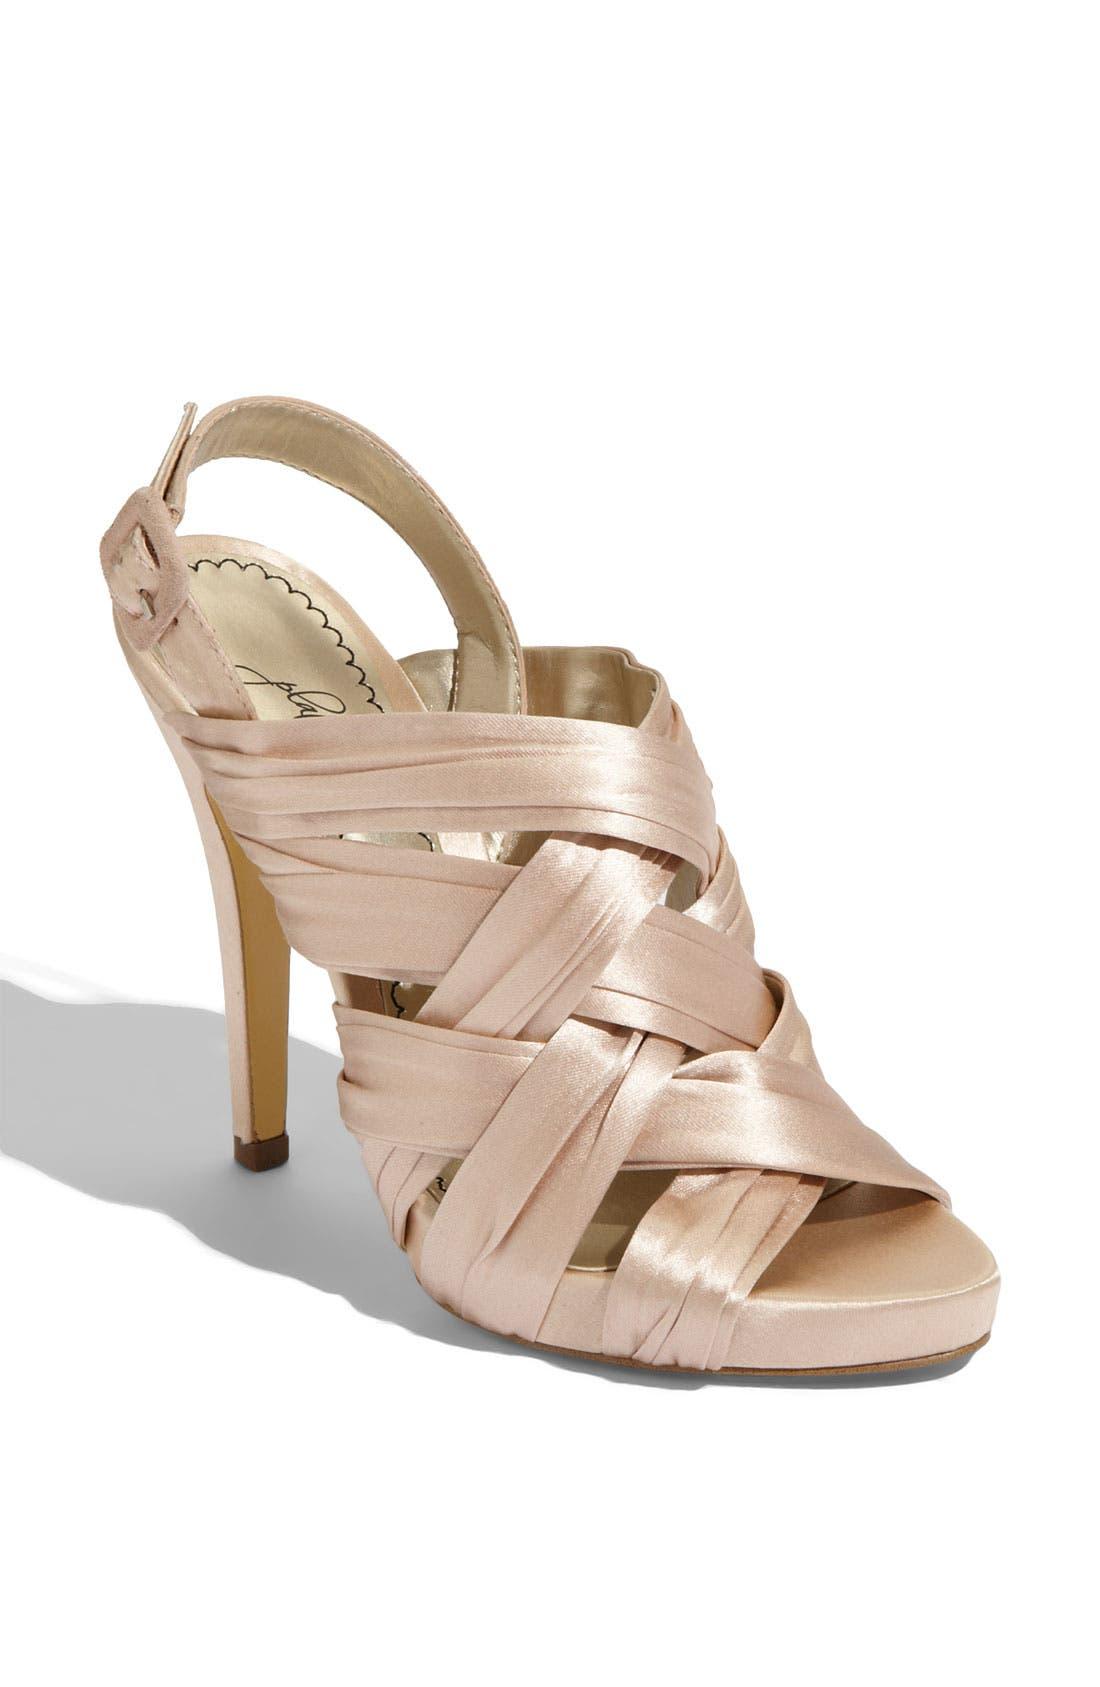 Alternate Image 1 Selected - BP. 'Kenna' Sandal